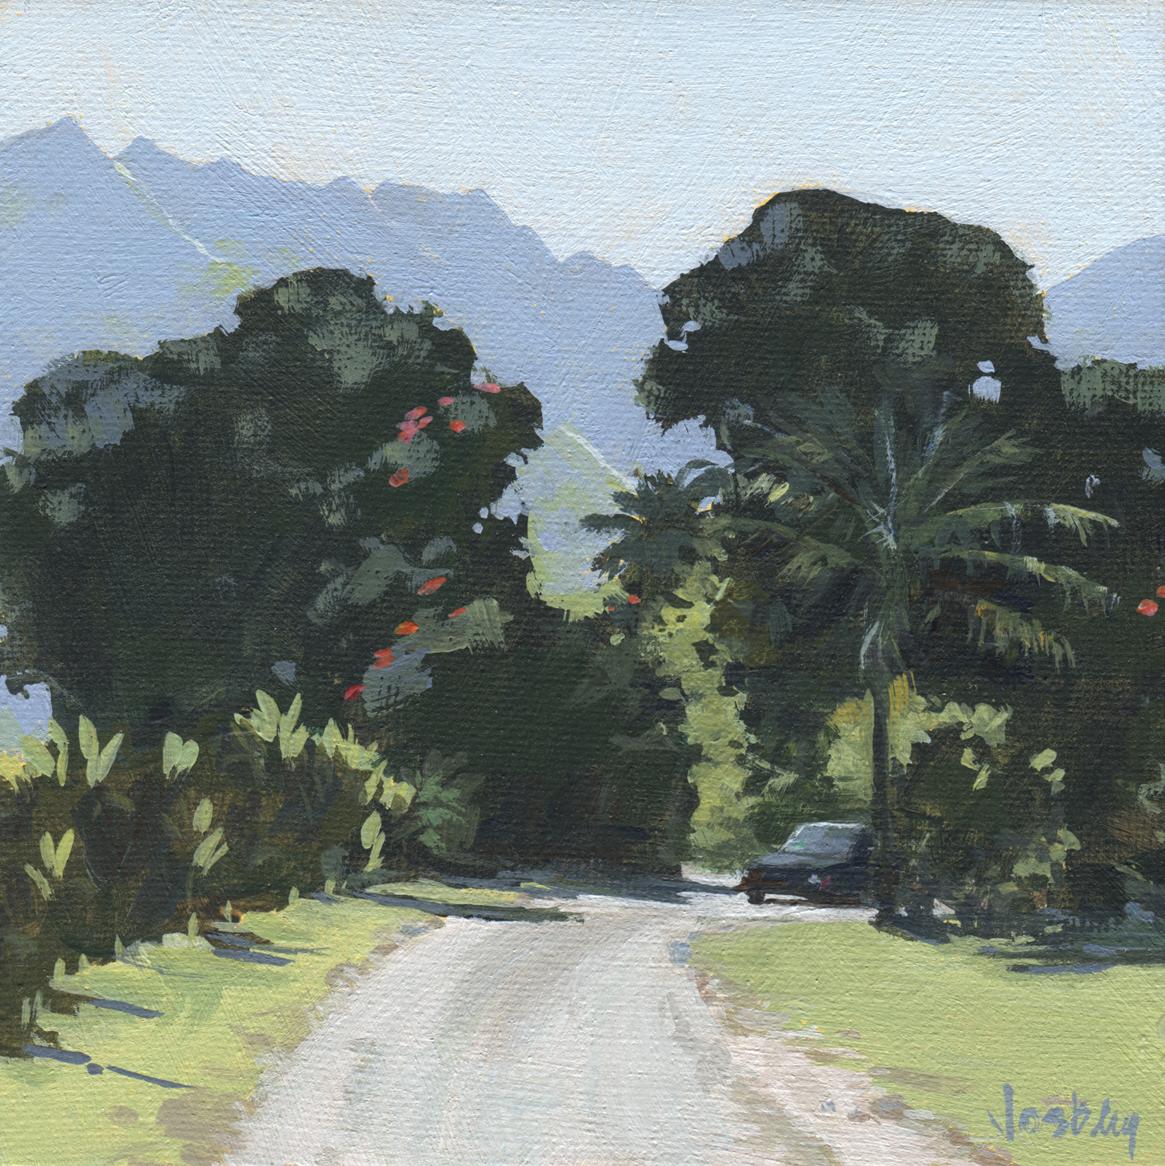 Hanalei Road. Kauai